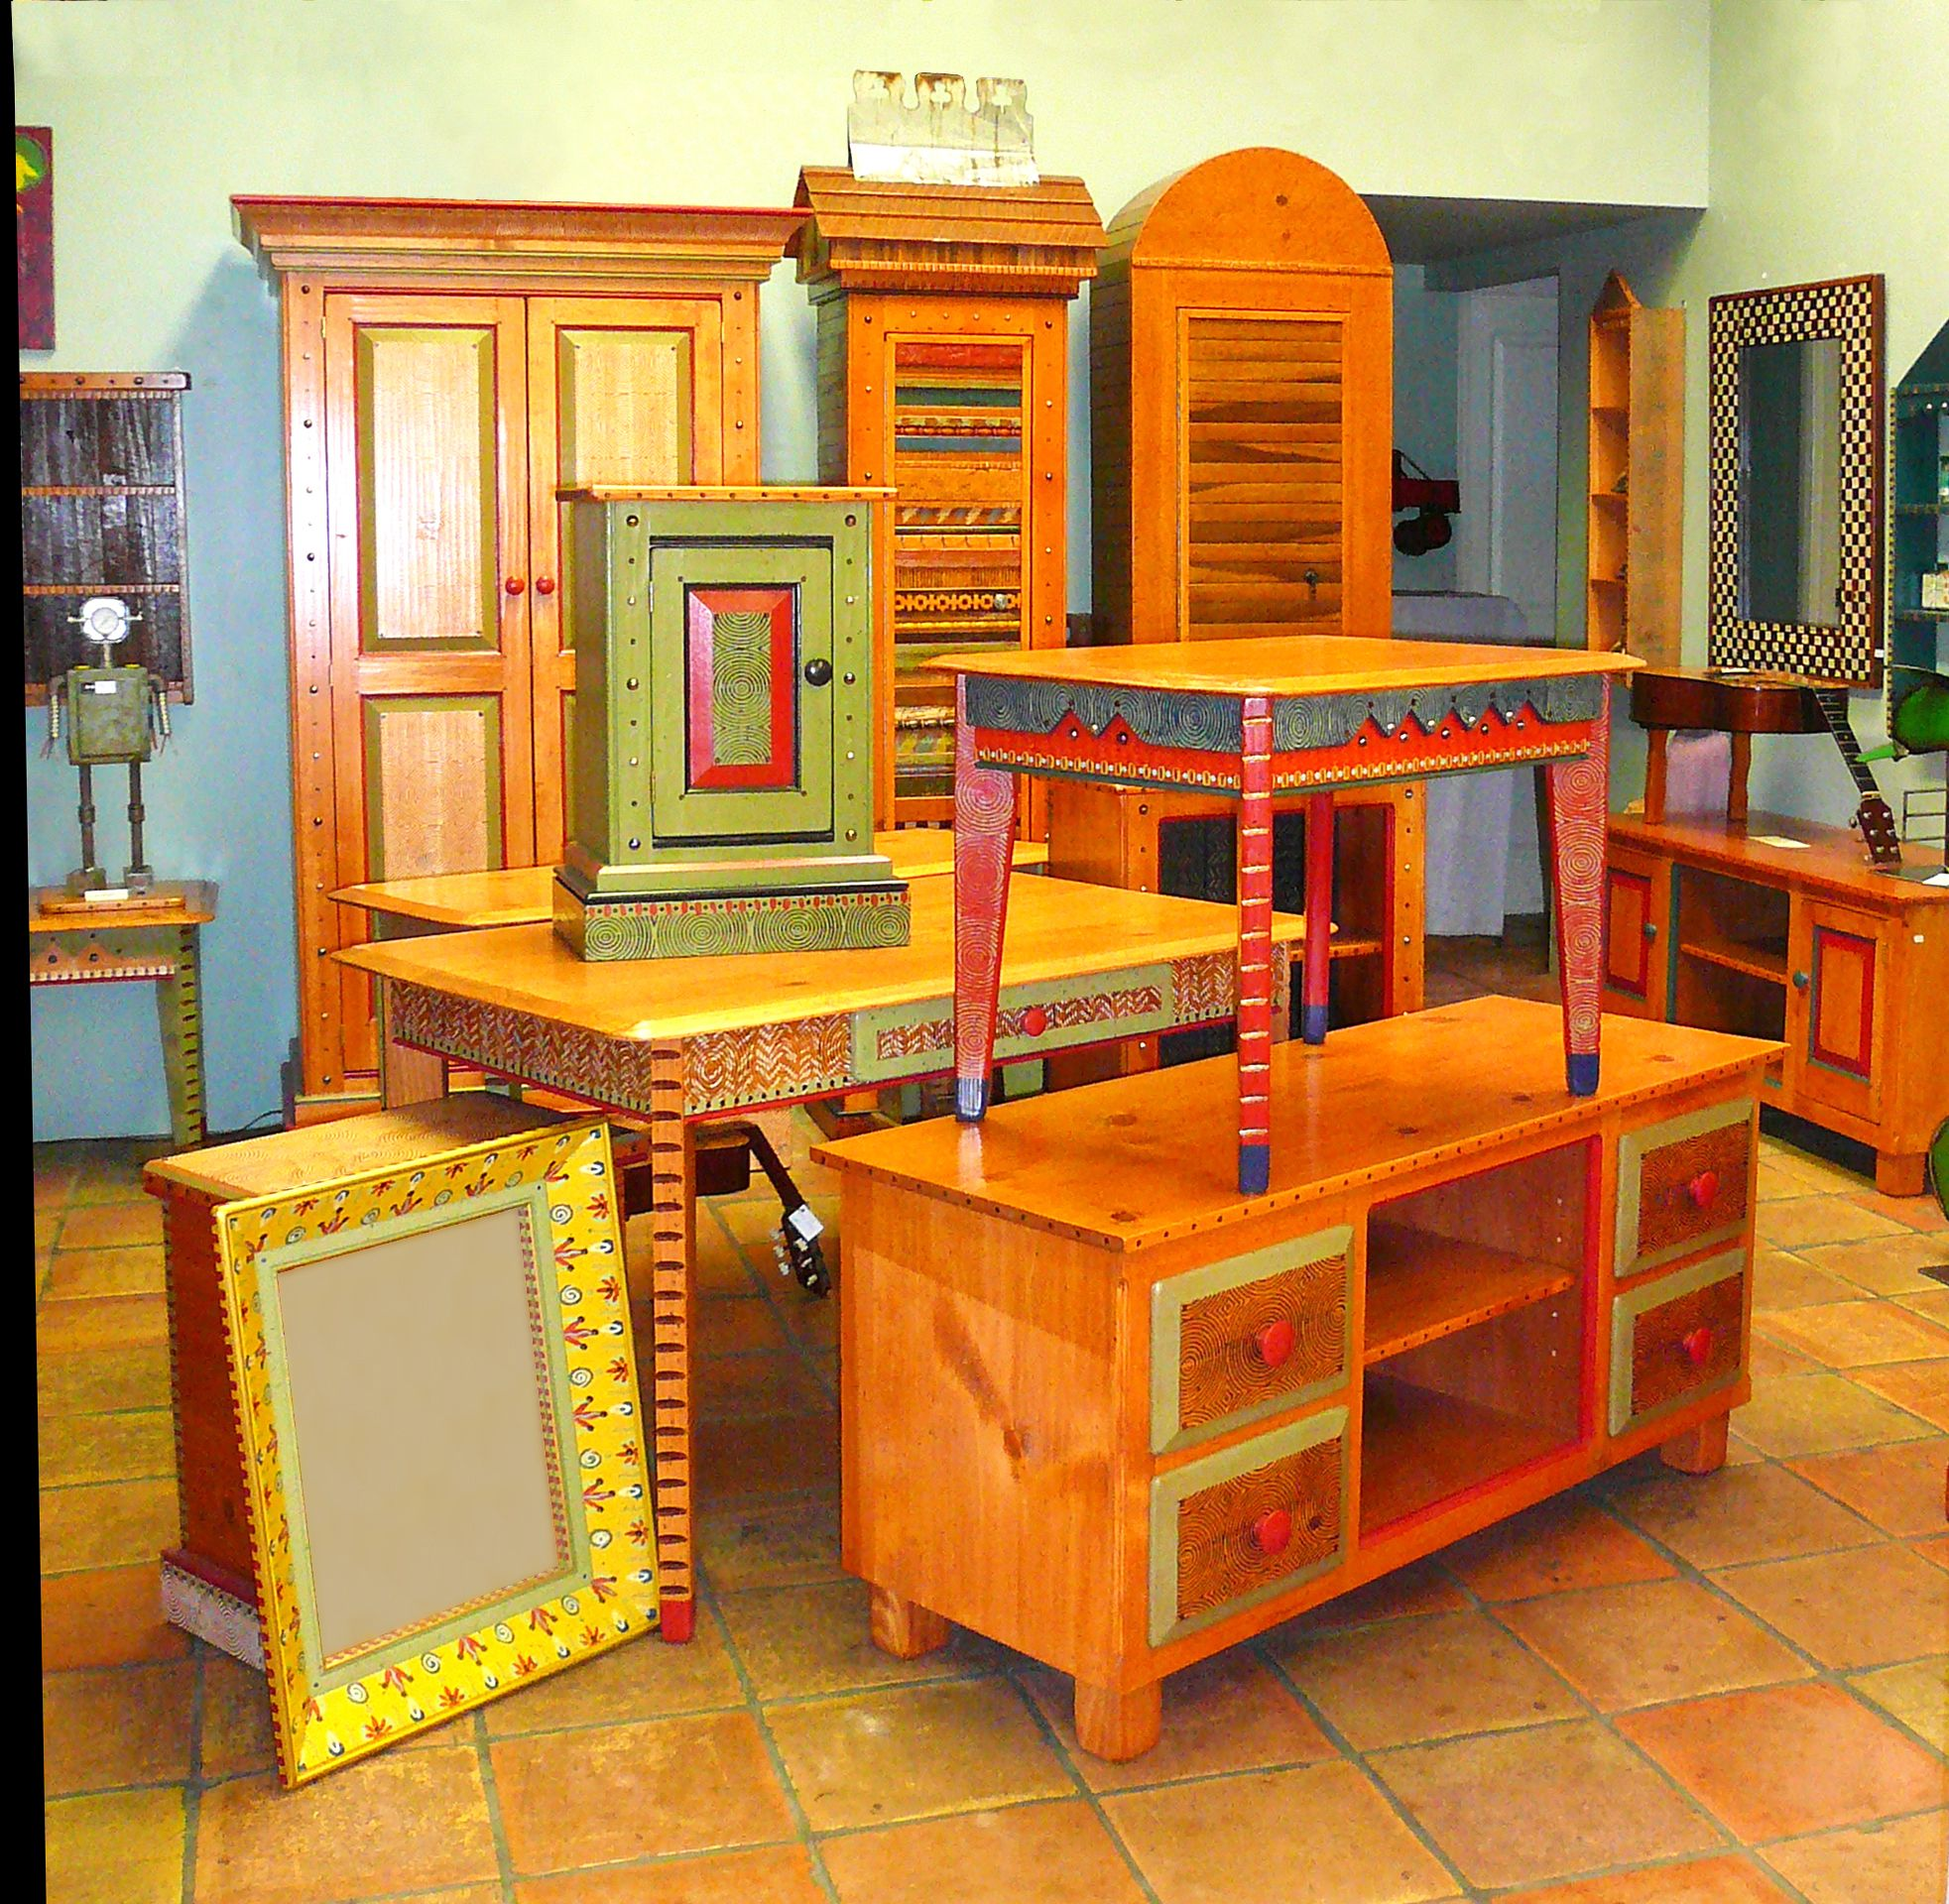 David Marsh Pine Furniture At Human Arts Gallery In Ojai, California.  Www.humanartsgallery